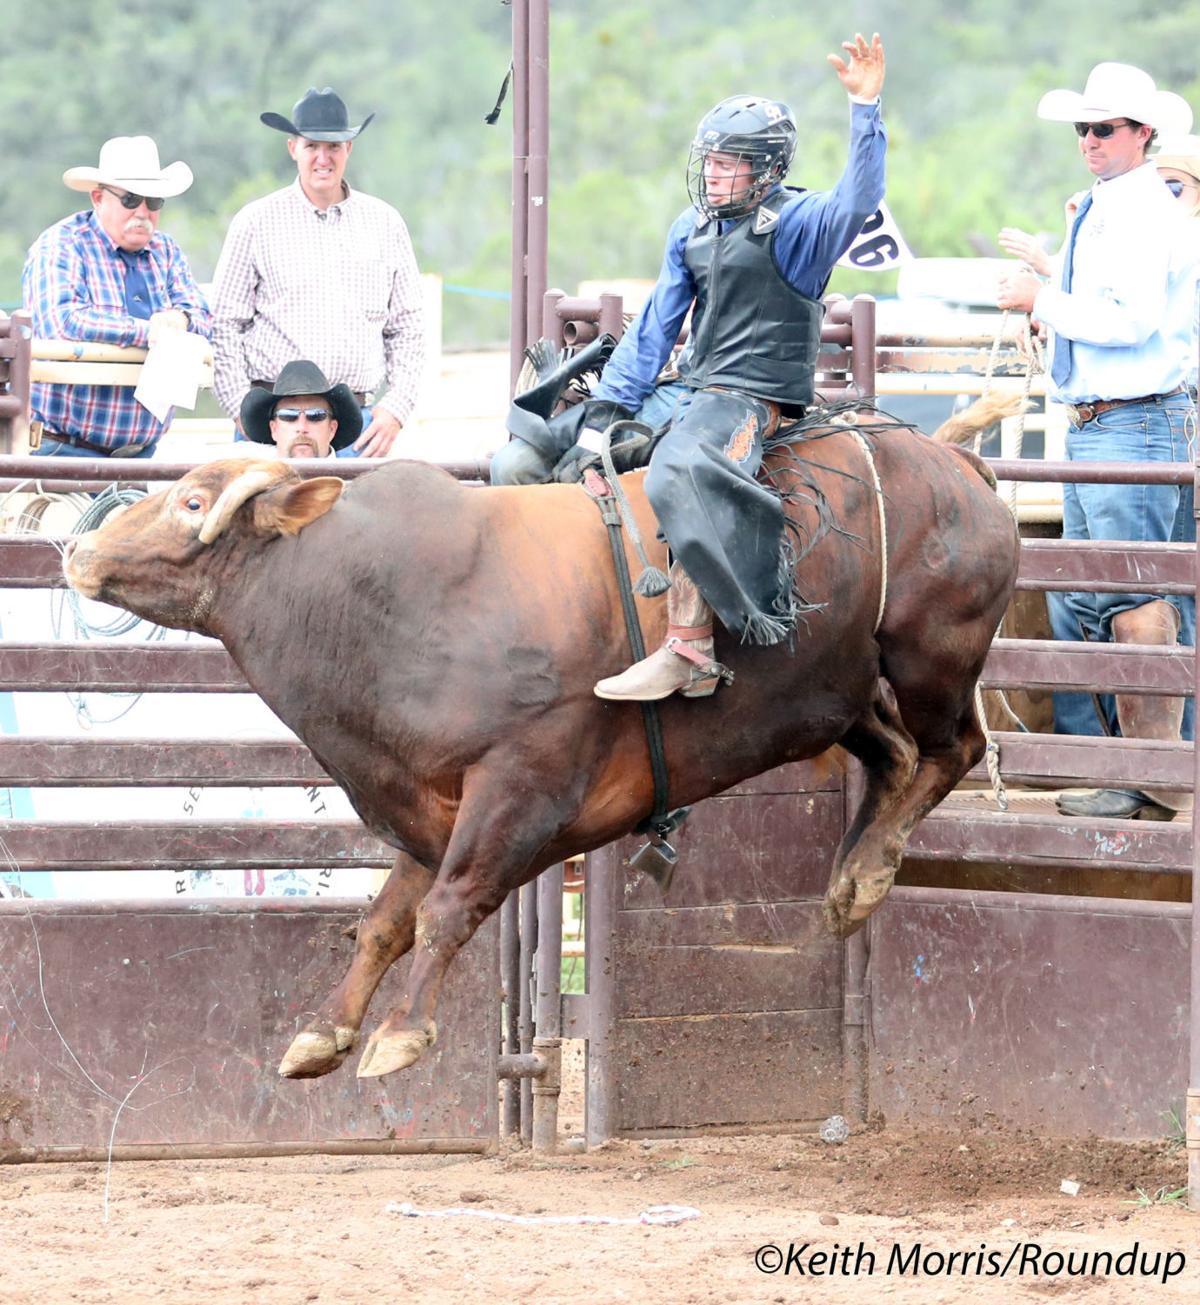 wm c300 Bull Riding-Sean Peterson-Bad Guy A95I1350.jpg